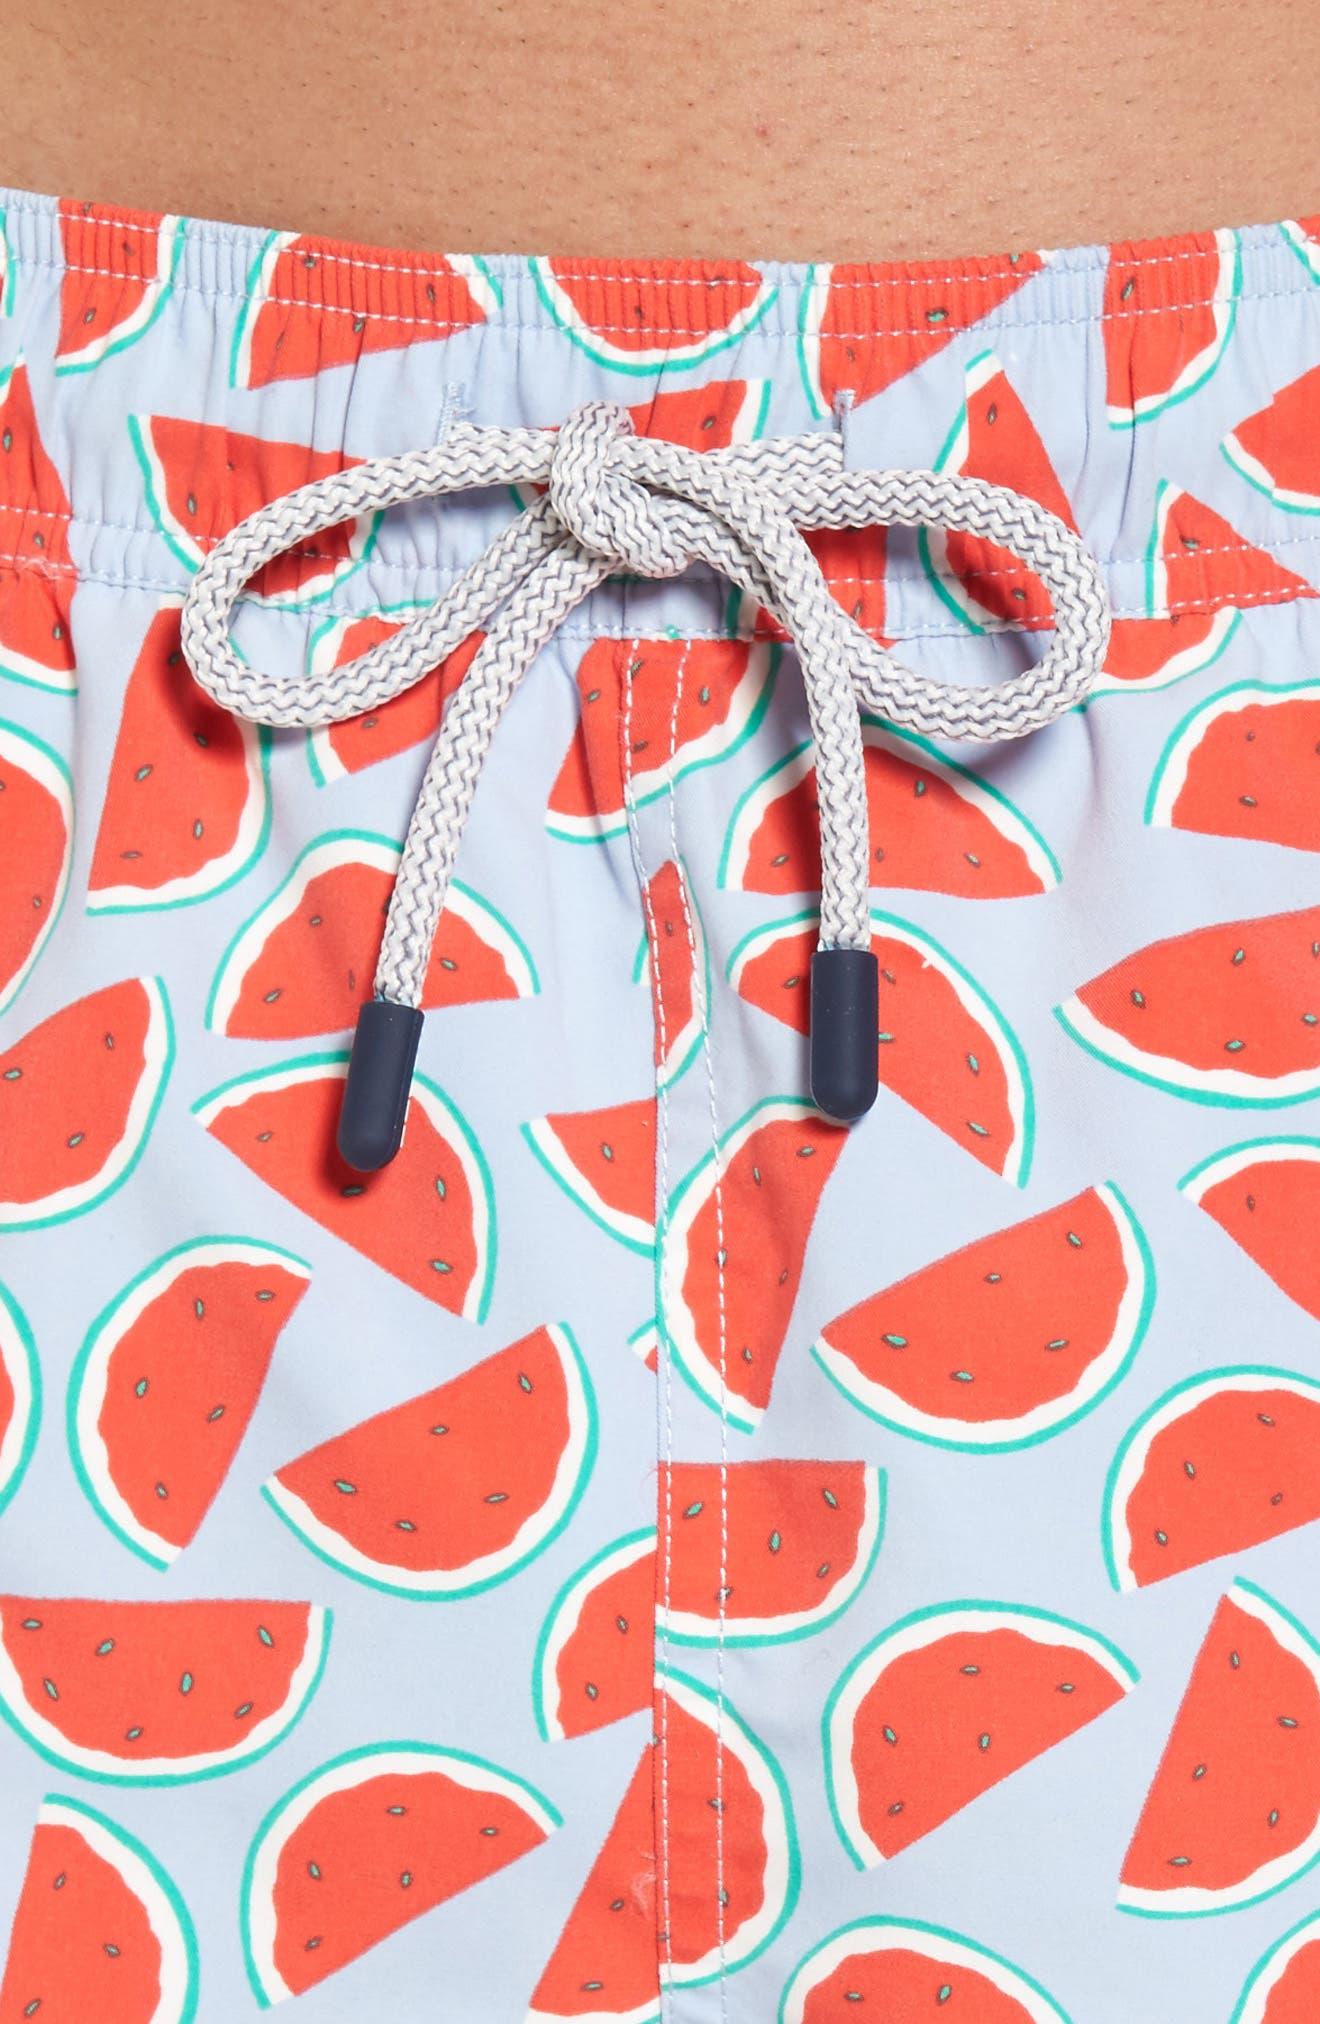 Watermelon Print Swim Trunks,                             Alternate thumbnail 4, color,                             Red